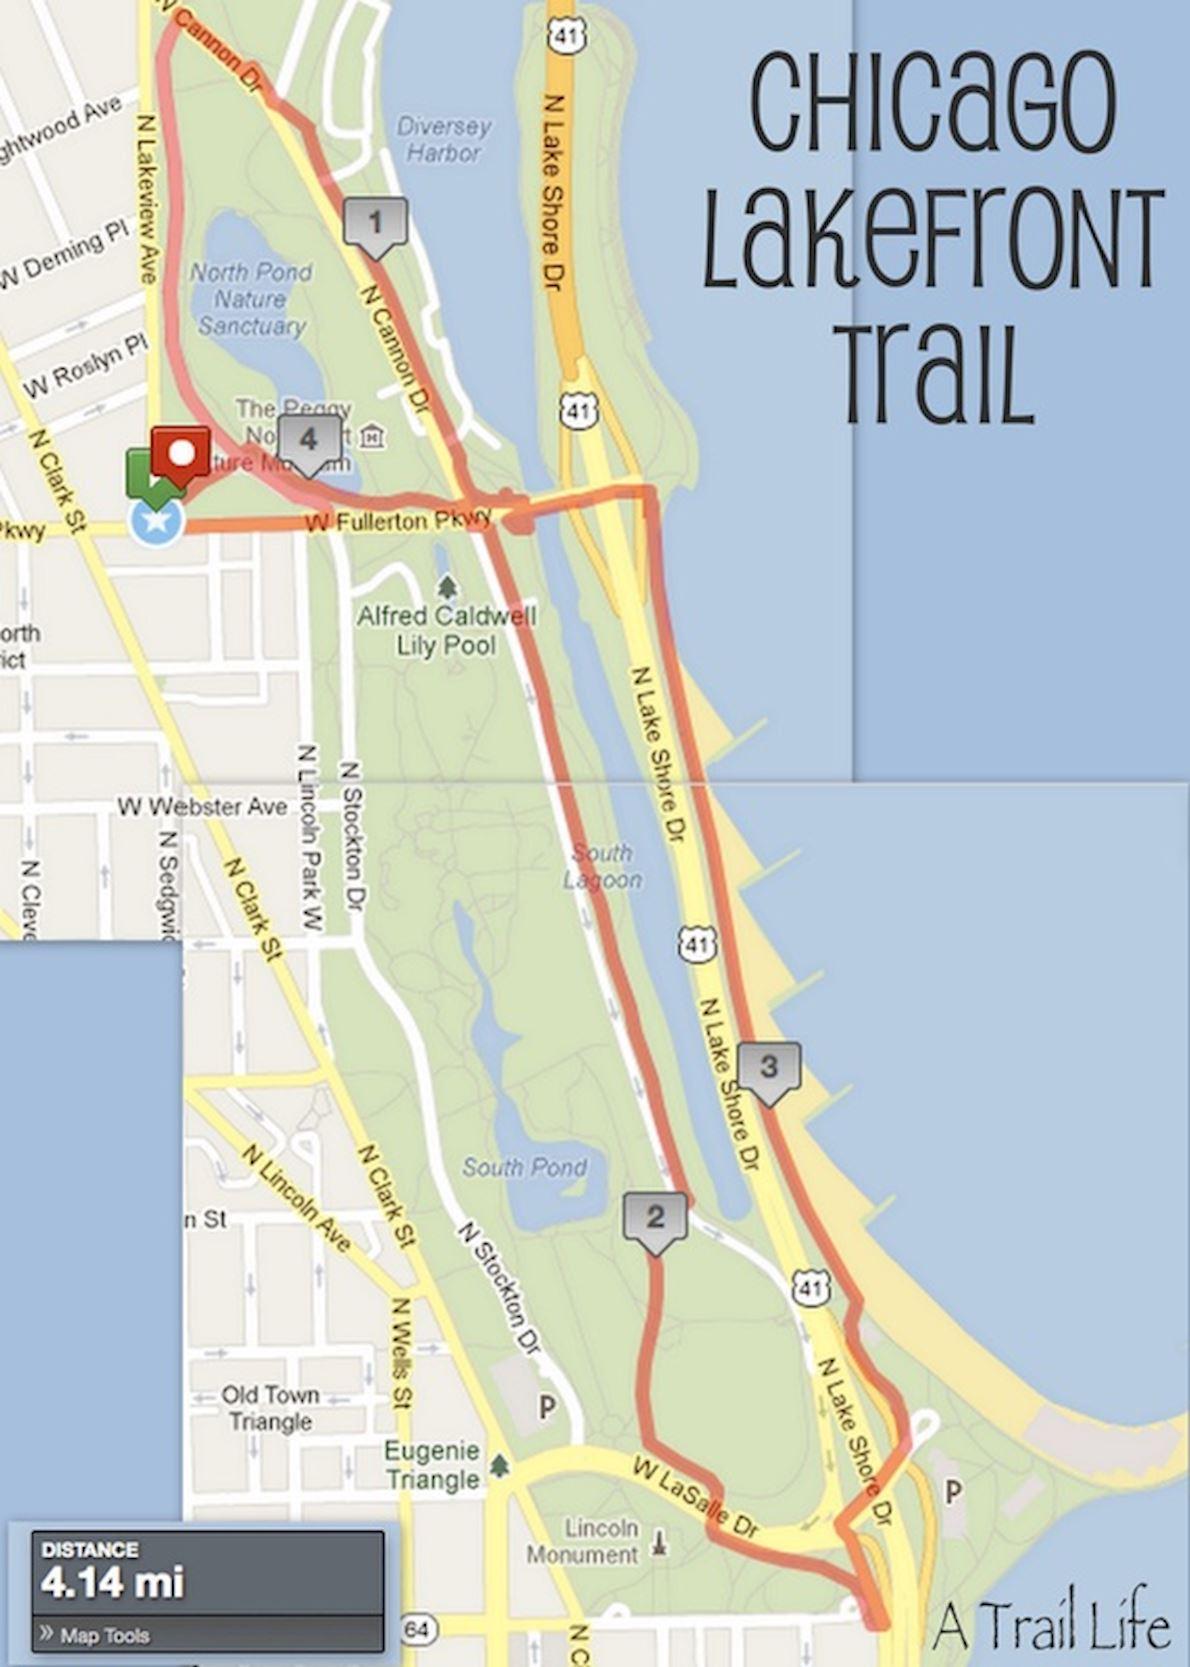 Chicago Lakefront 50/50   World's Marathons on